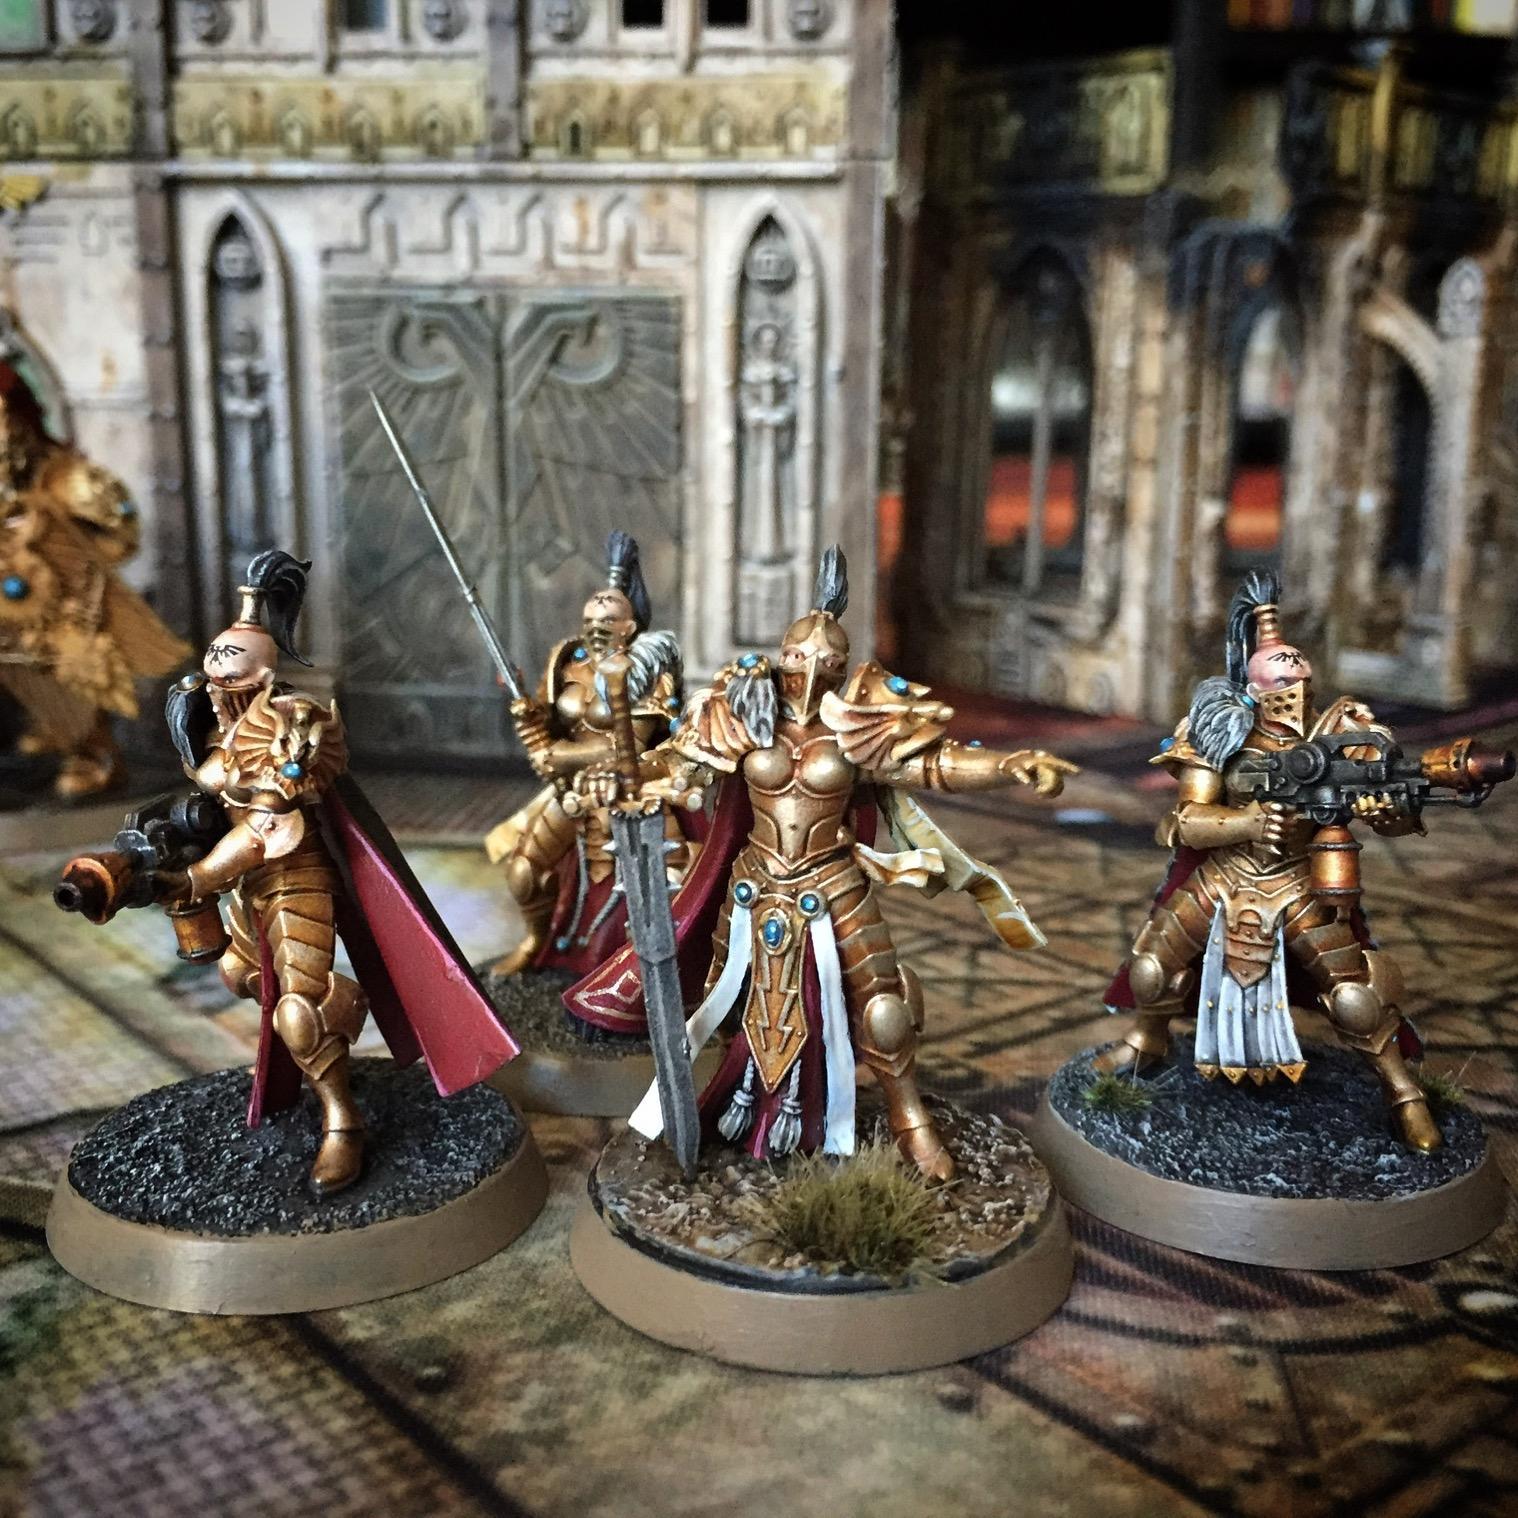 Burning Of Prospero, Horus Heresy, Space Wolves, Thousan Sons